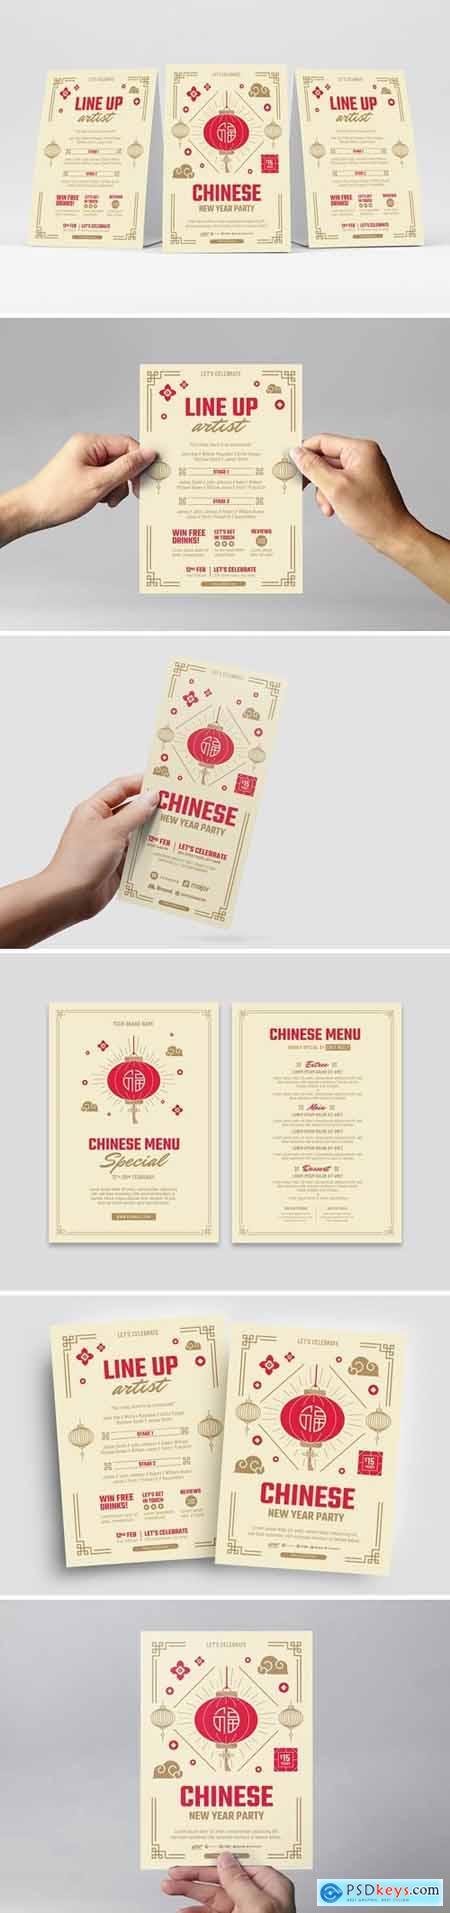 Chinese New Year Templates AYY8V2V